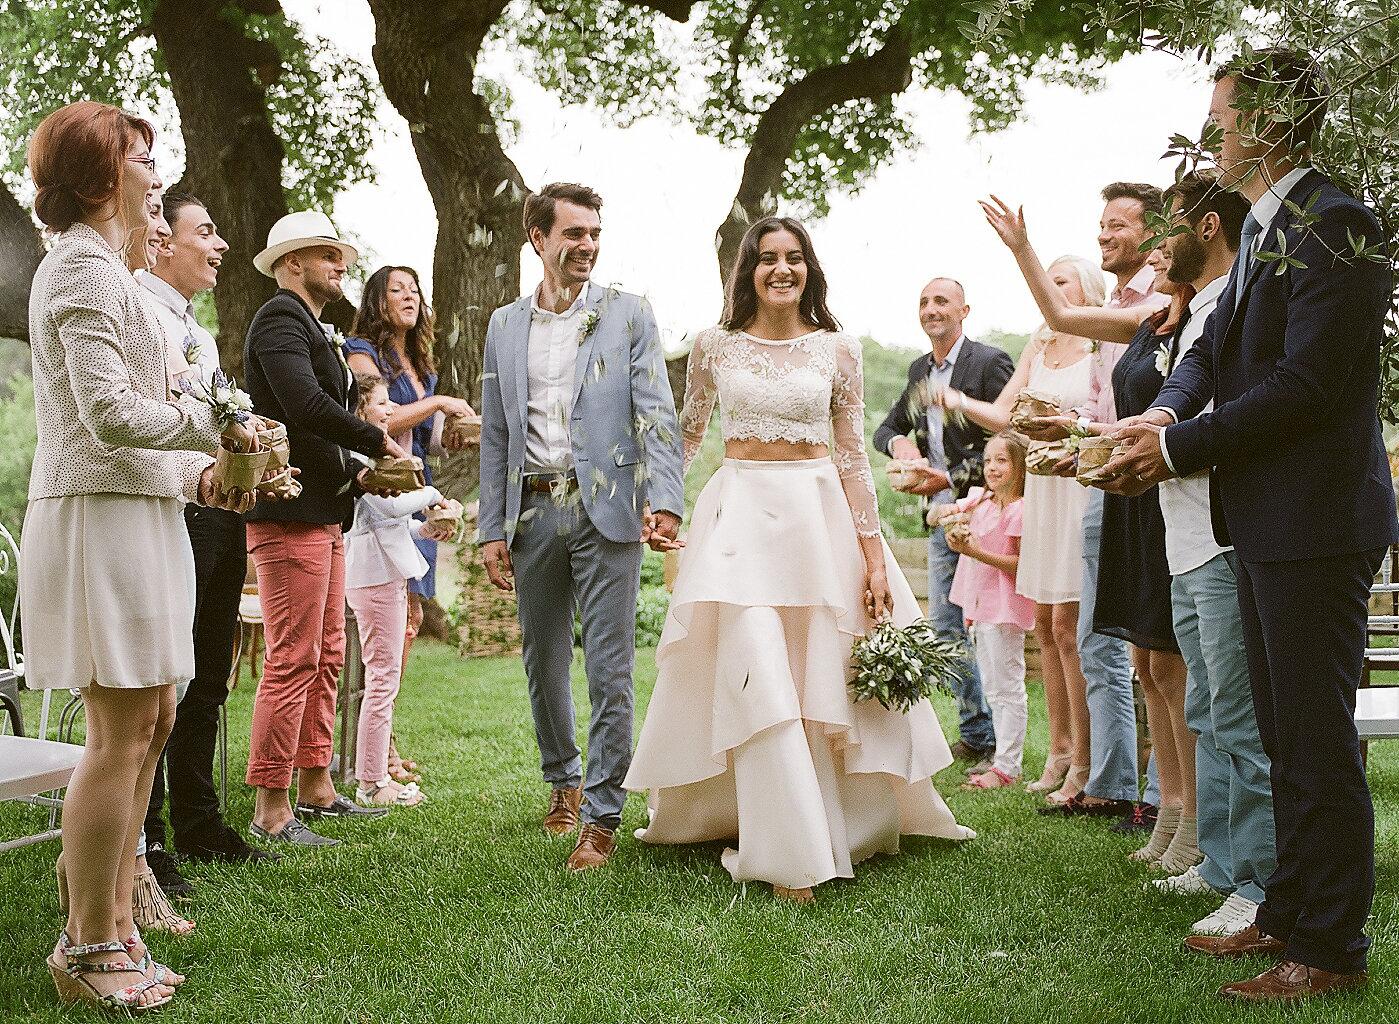 le coeur dans les etoiles - wedding planner - provence - luberon - alpilles - drome - vaucluse - sardaigne - italie - organisation - mariage - shooting - dolce vita - valery villard-325